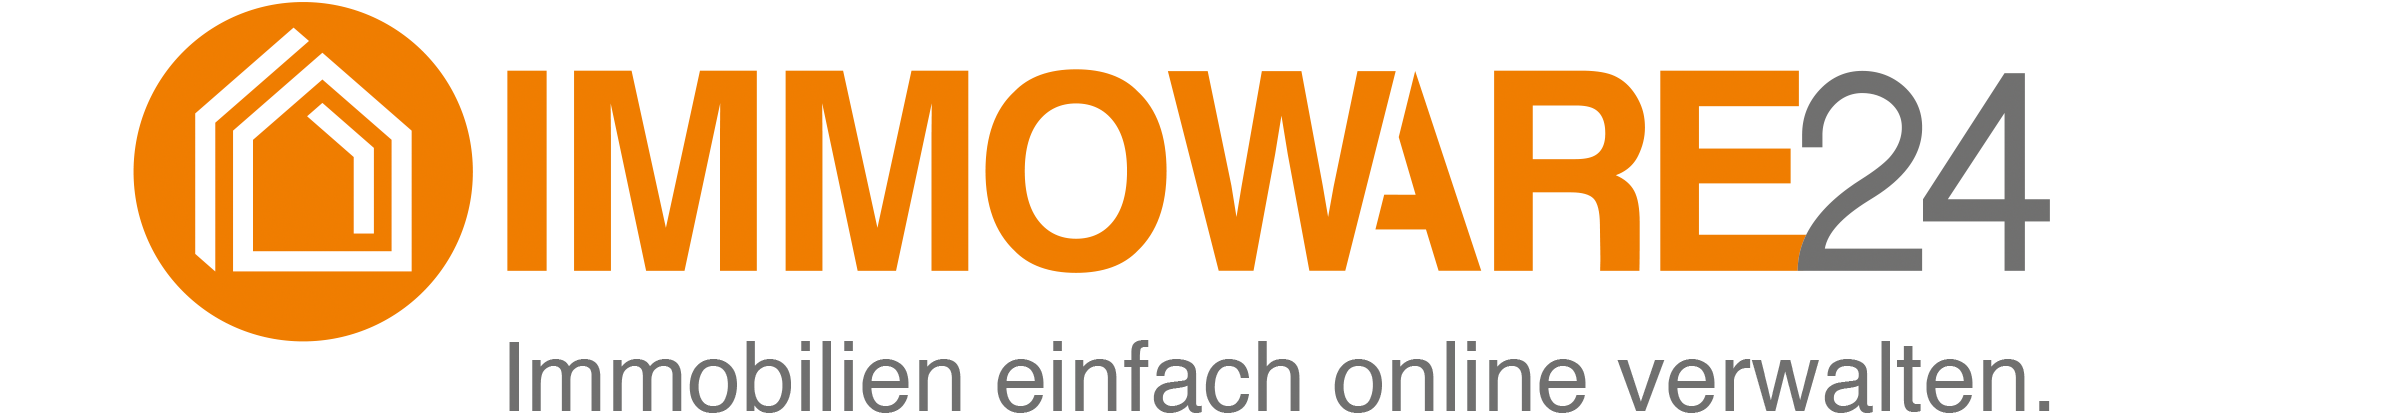 Logo Immoware24